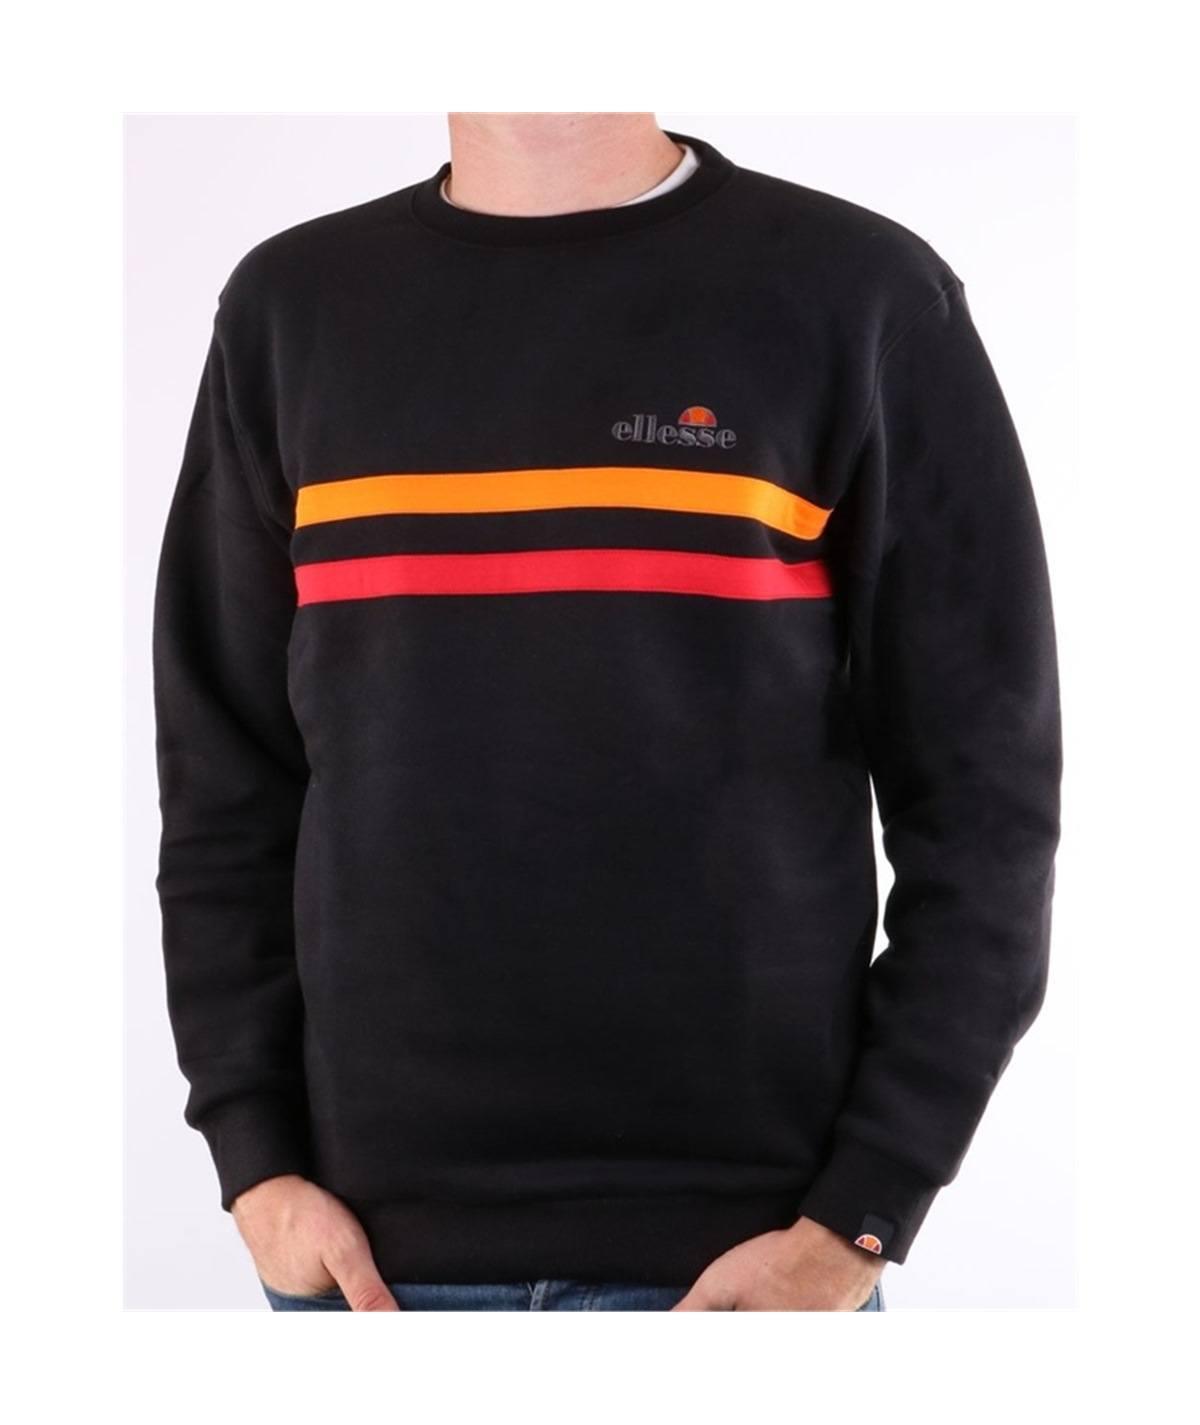 felpa ellesse-erminion-sweatshirt-black-orange-red romanista